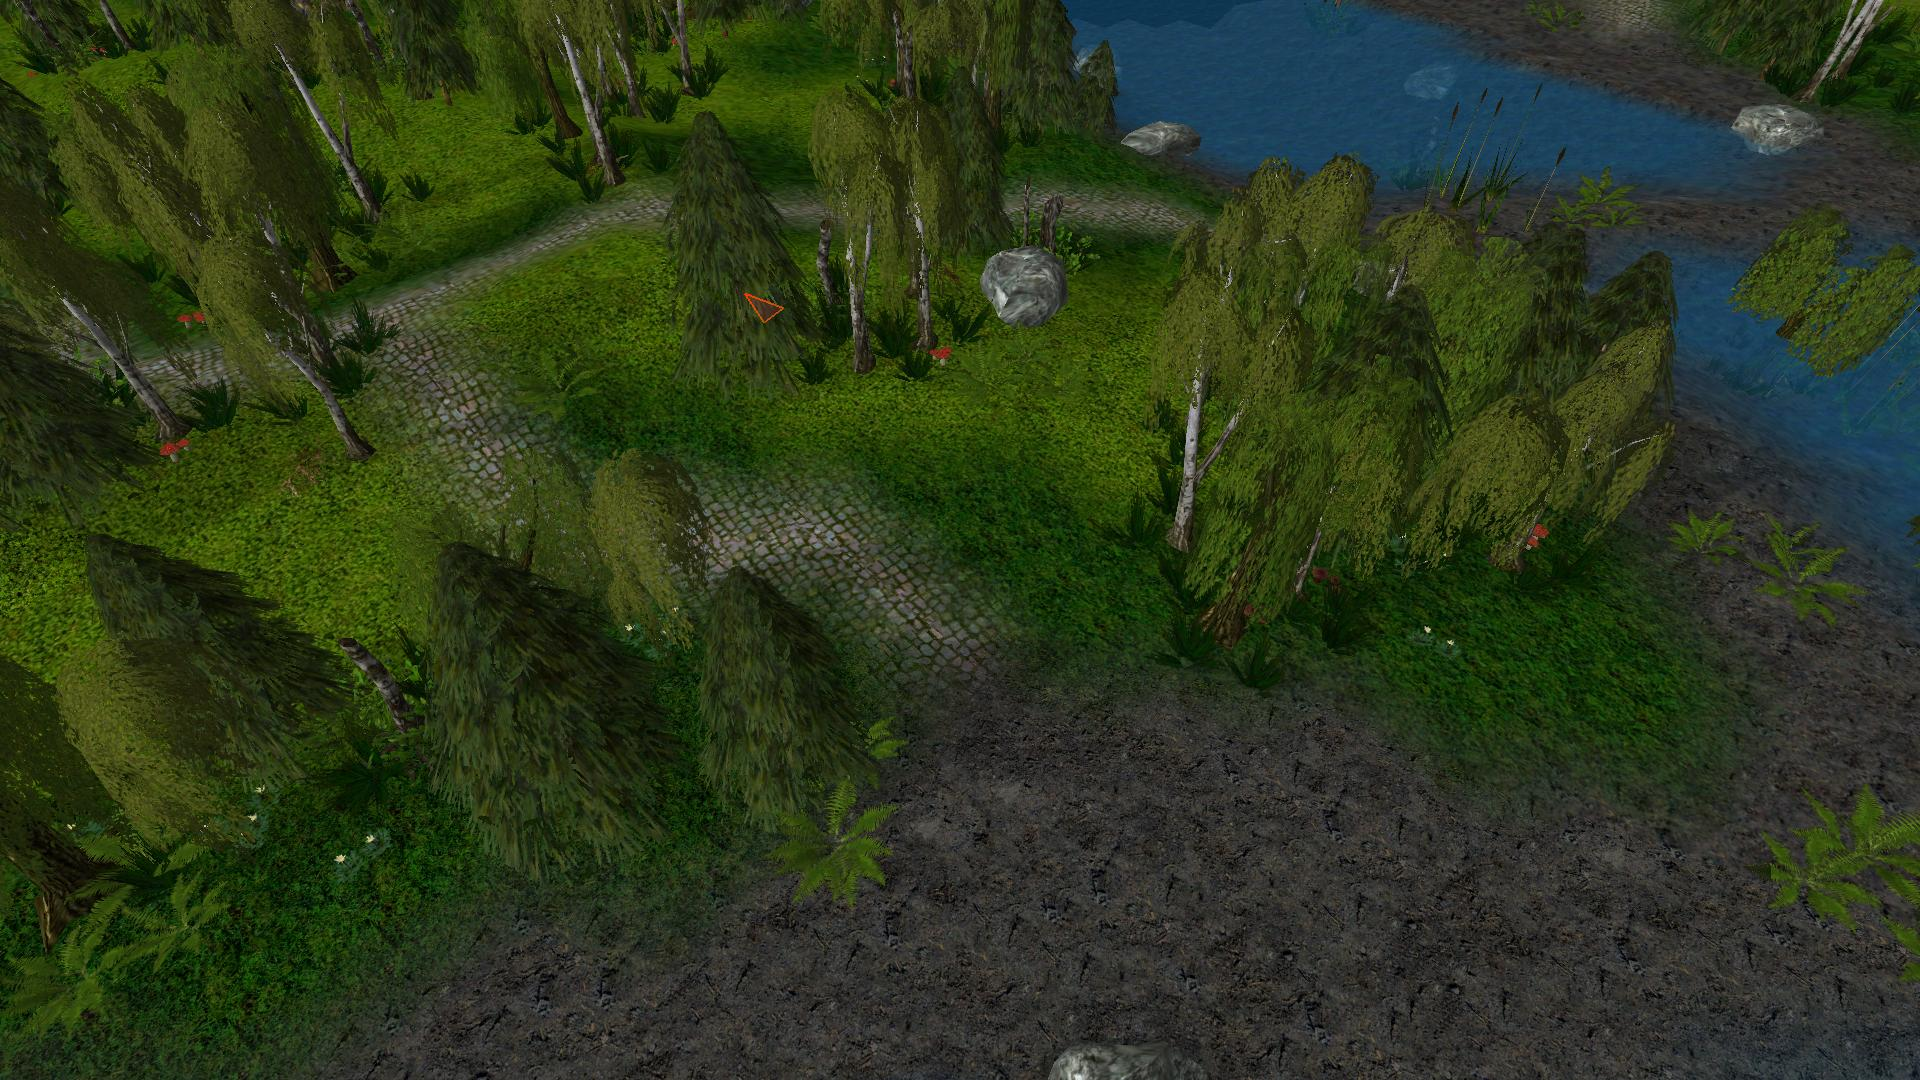 http://mods.megaglest.org/tilesets/birch_forest.jpg